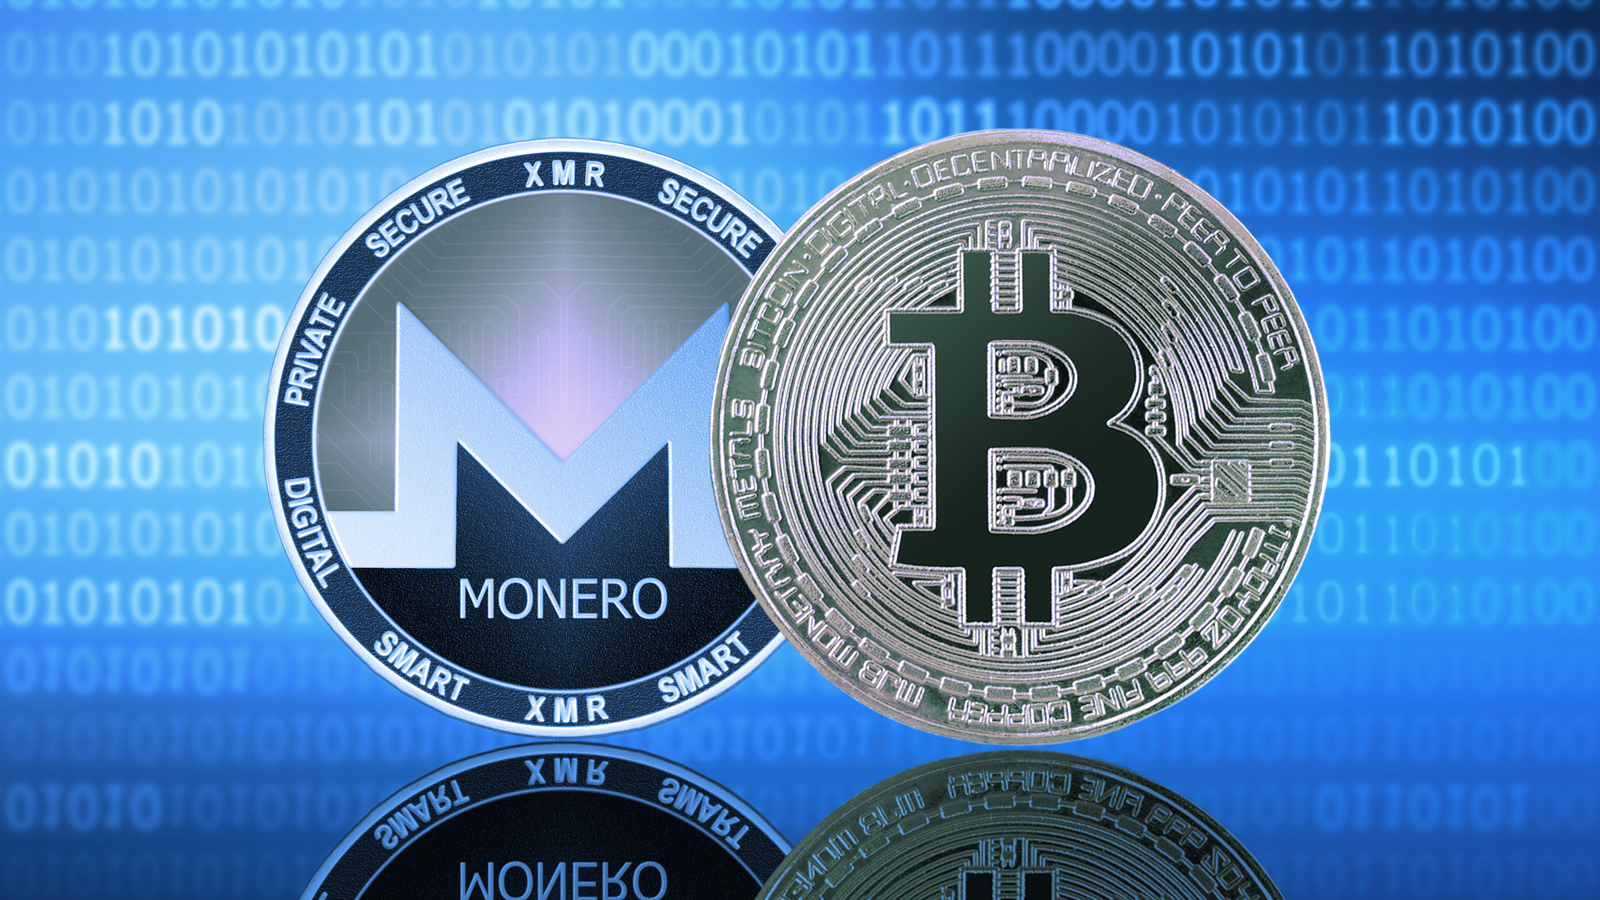 Far-Right Activists Raise Millions in Bitcoin, Monero: AP